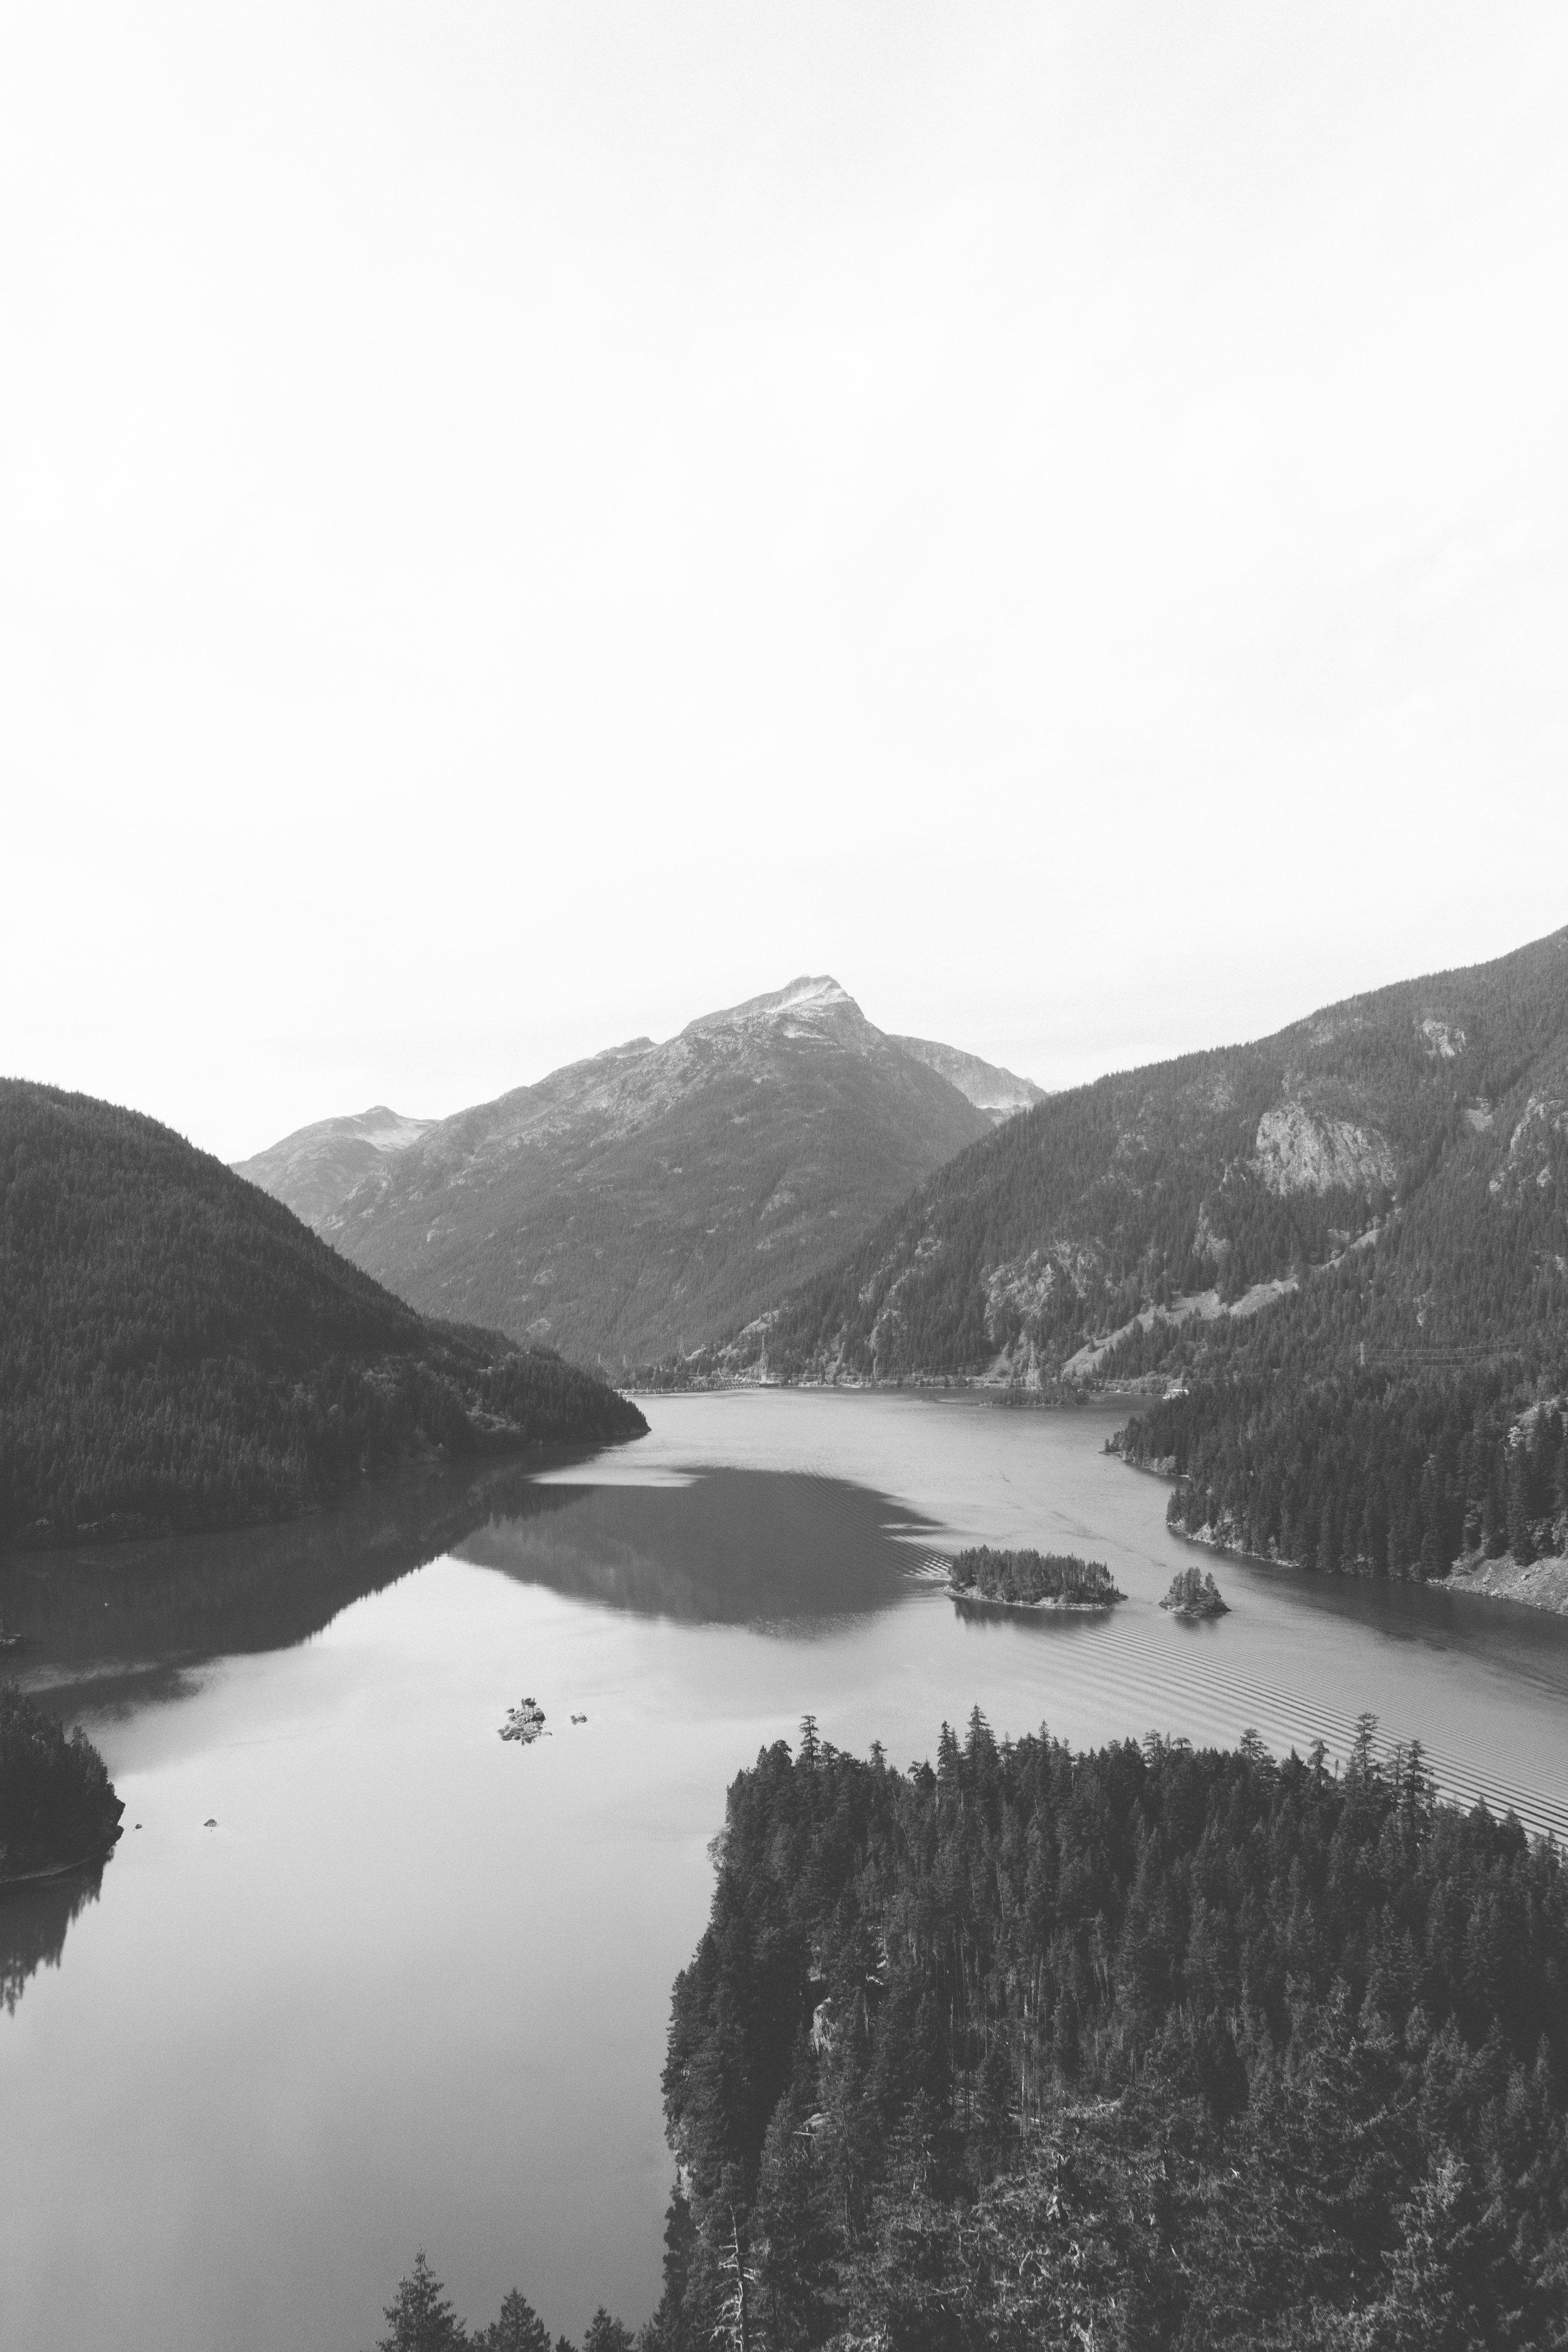 diablo lake overlook - b+w